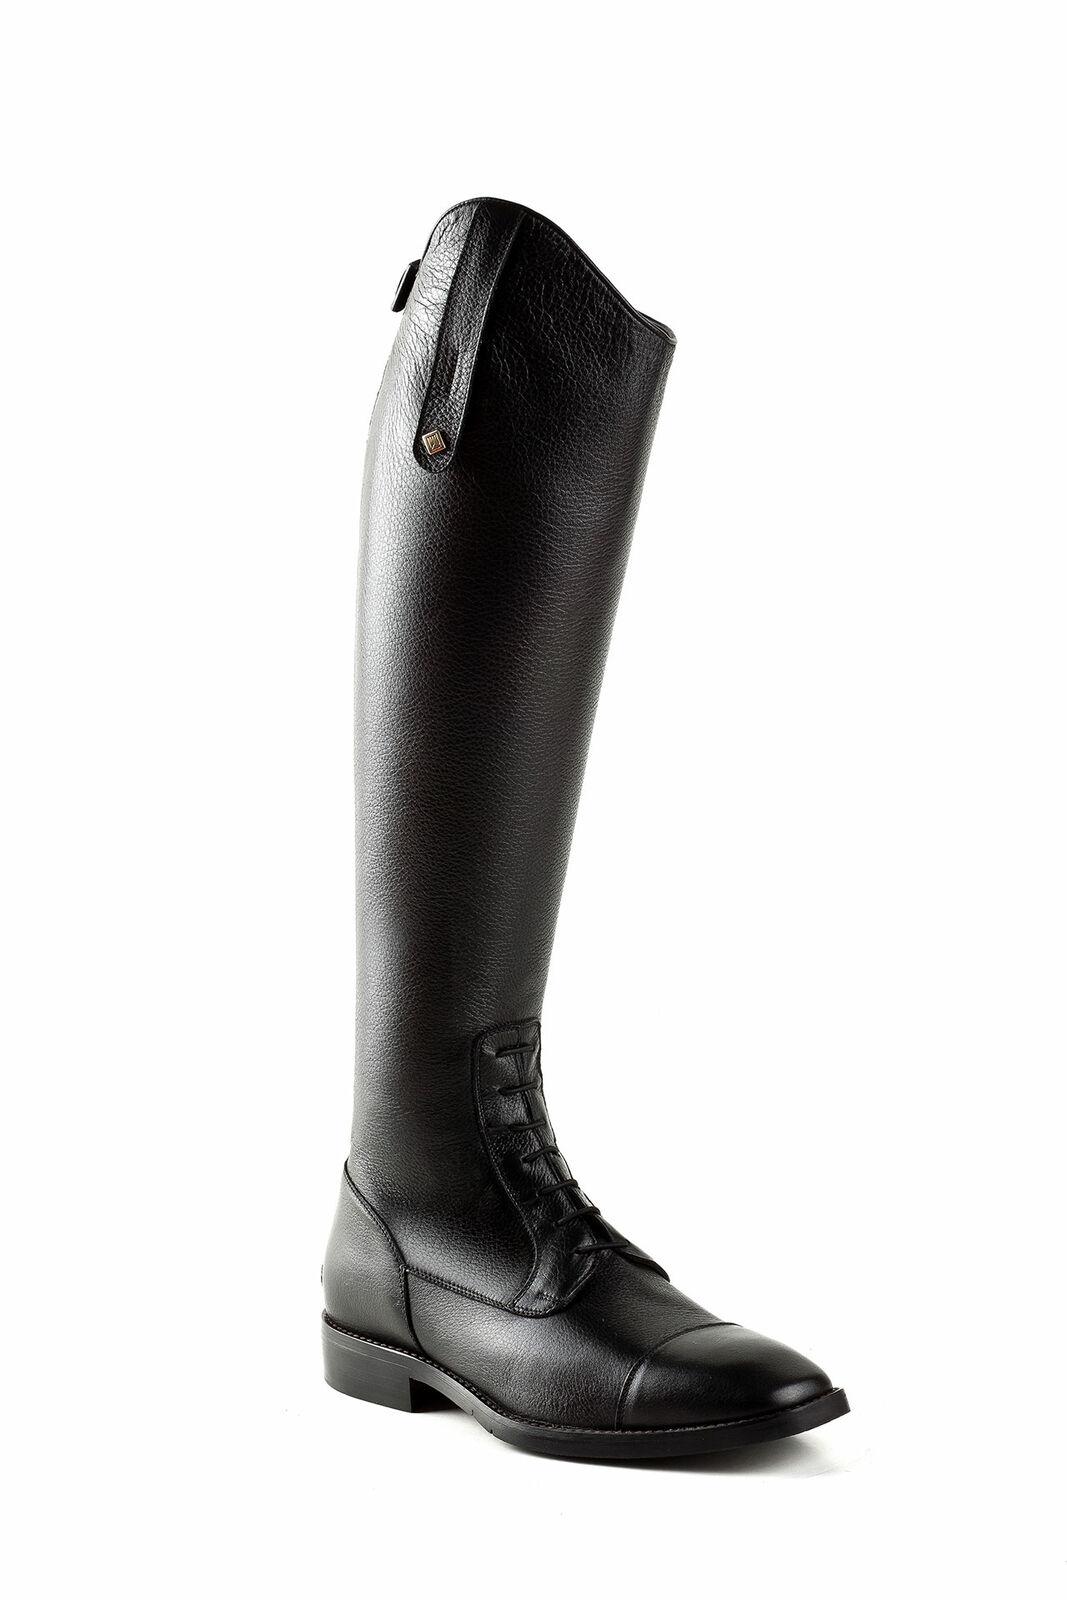 botas de DeNiro S3312 negro  36 A   XS saltar botas soft quick  Venta en línea de descuento de fábrica